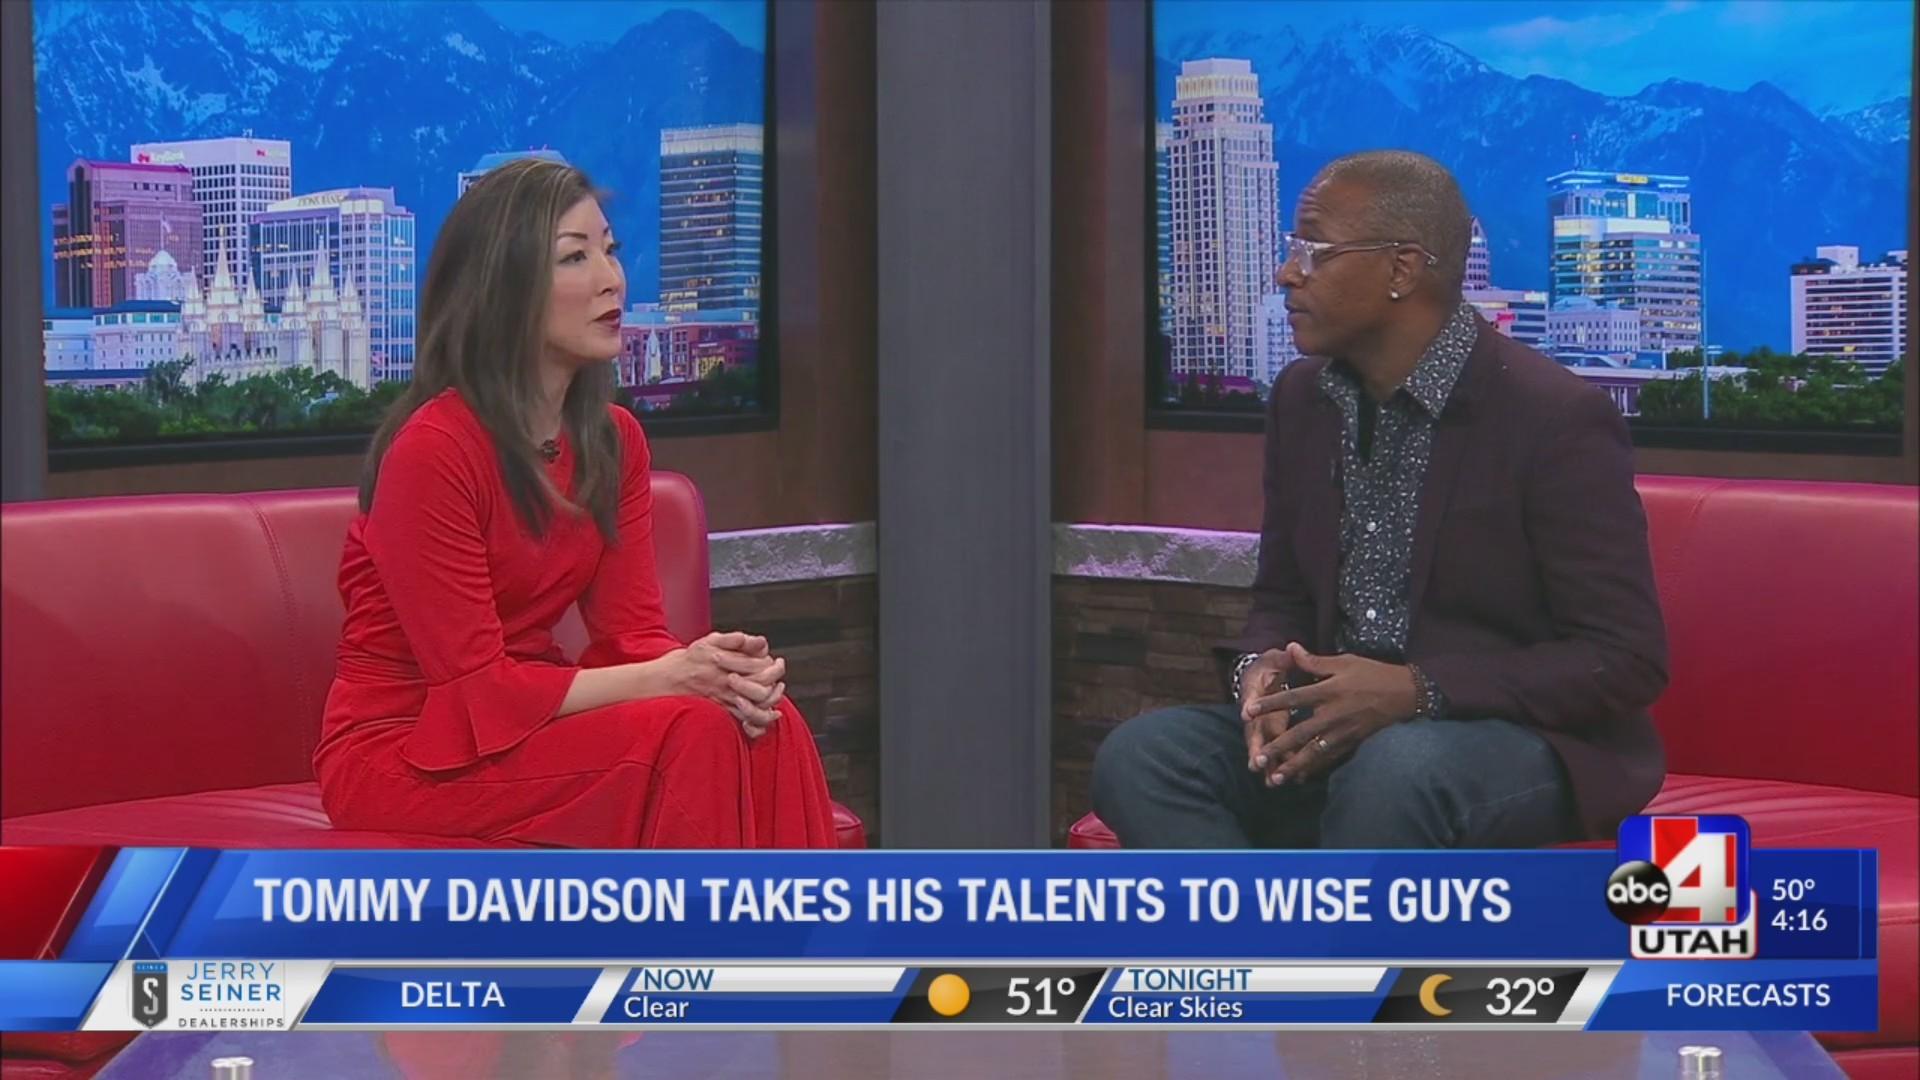 Tommy Davidson headlines Wise Guys